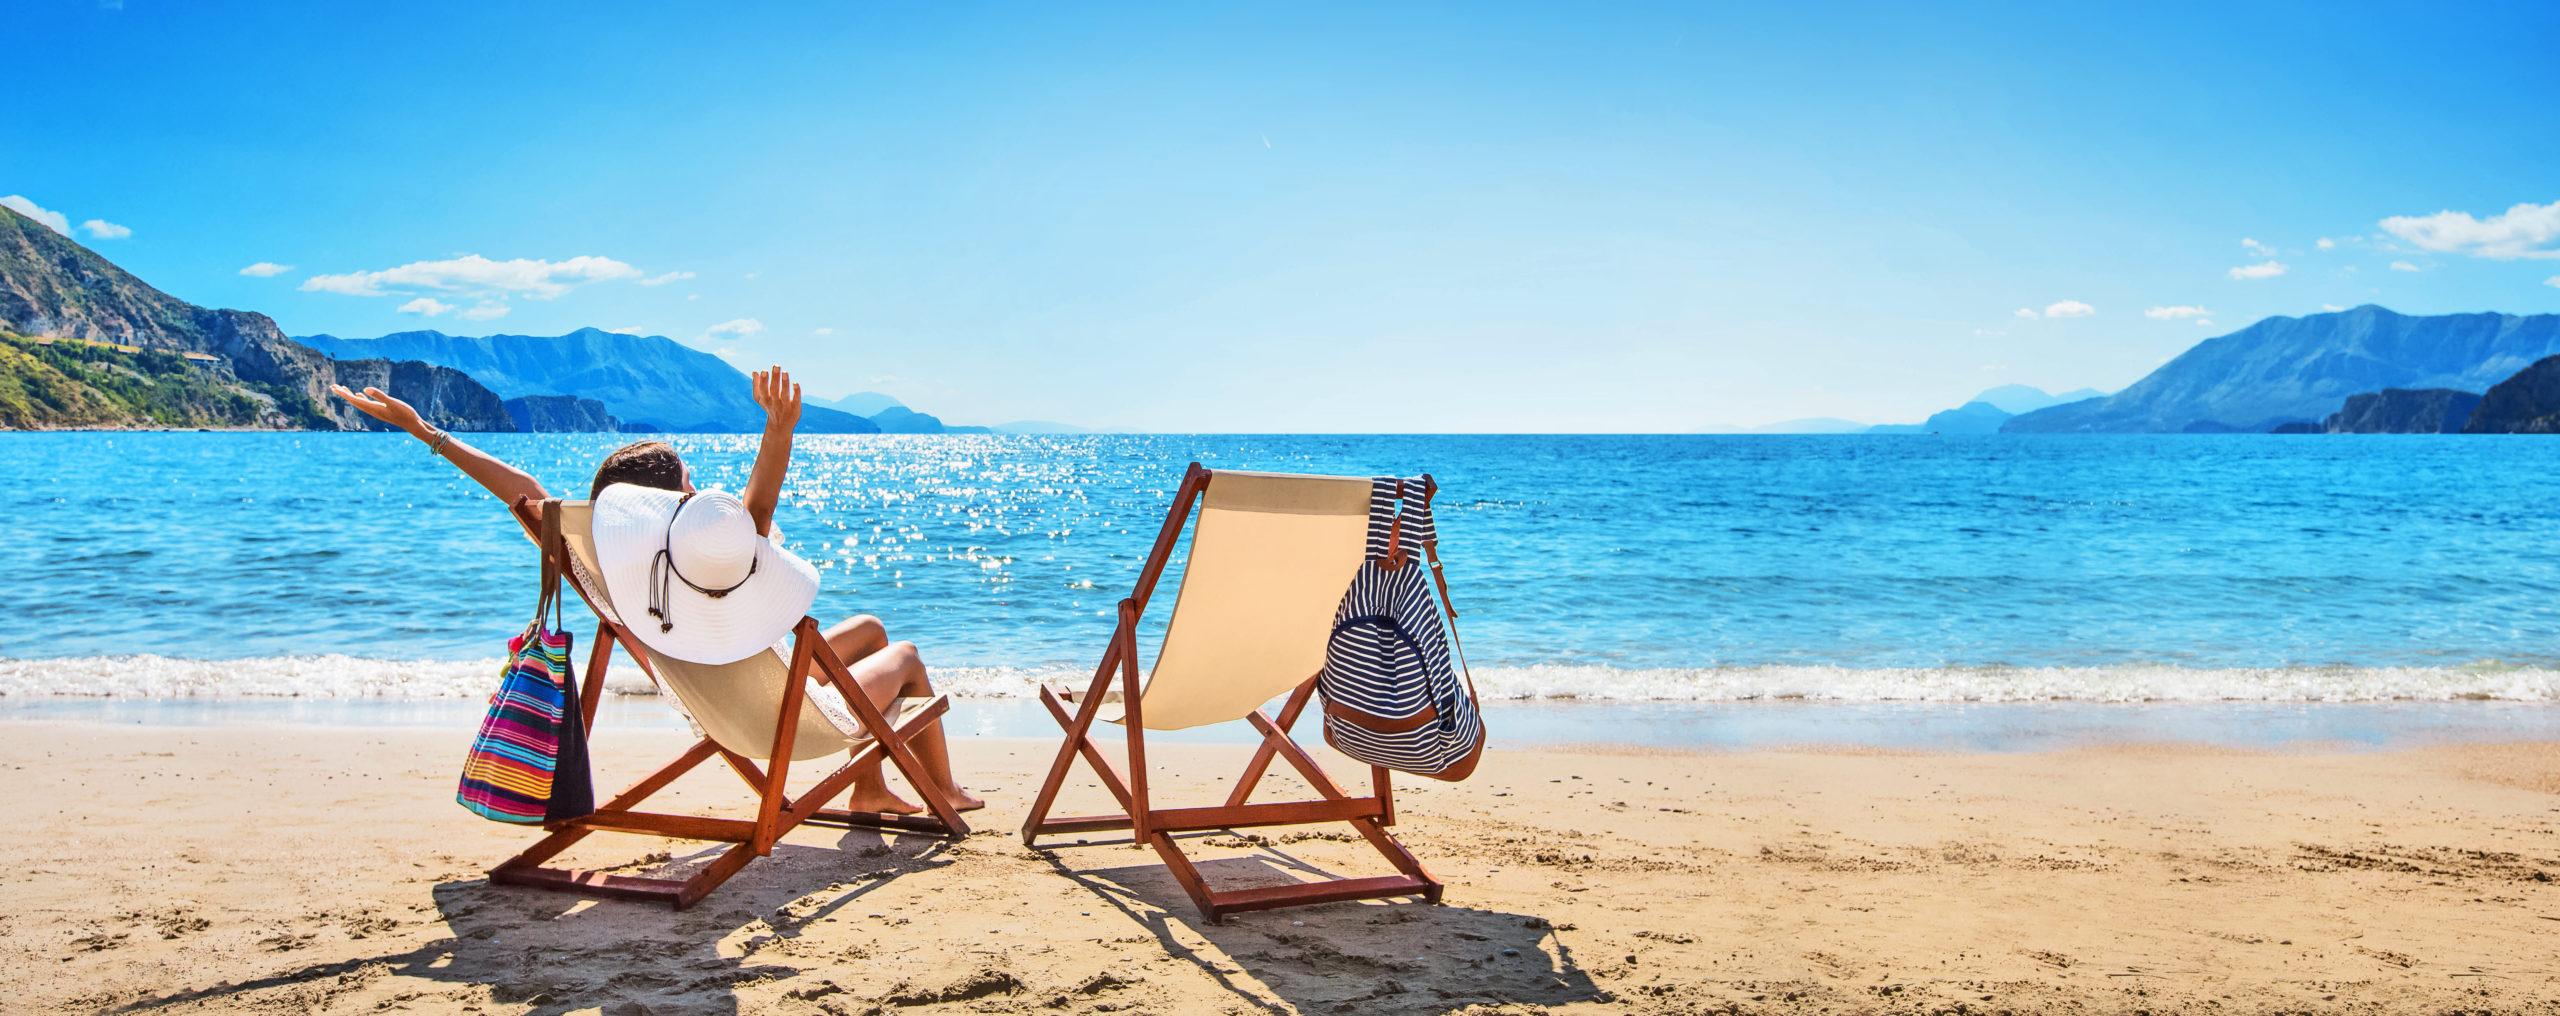 Woman Enjoying Sunbathing at Beach. Summer Vacation